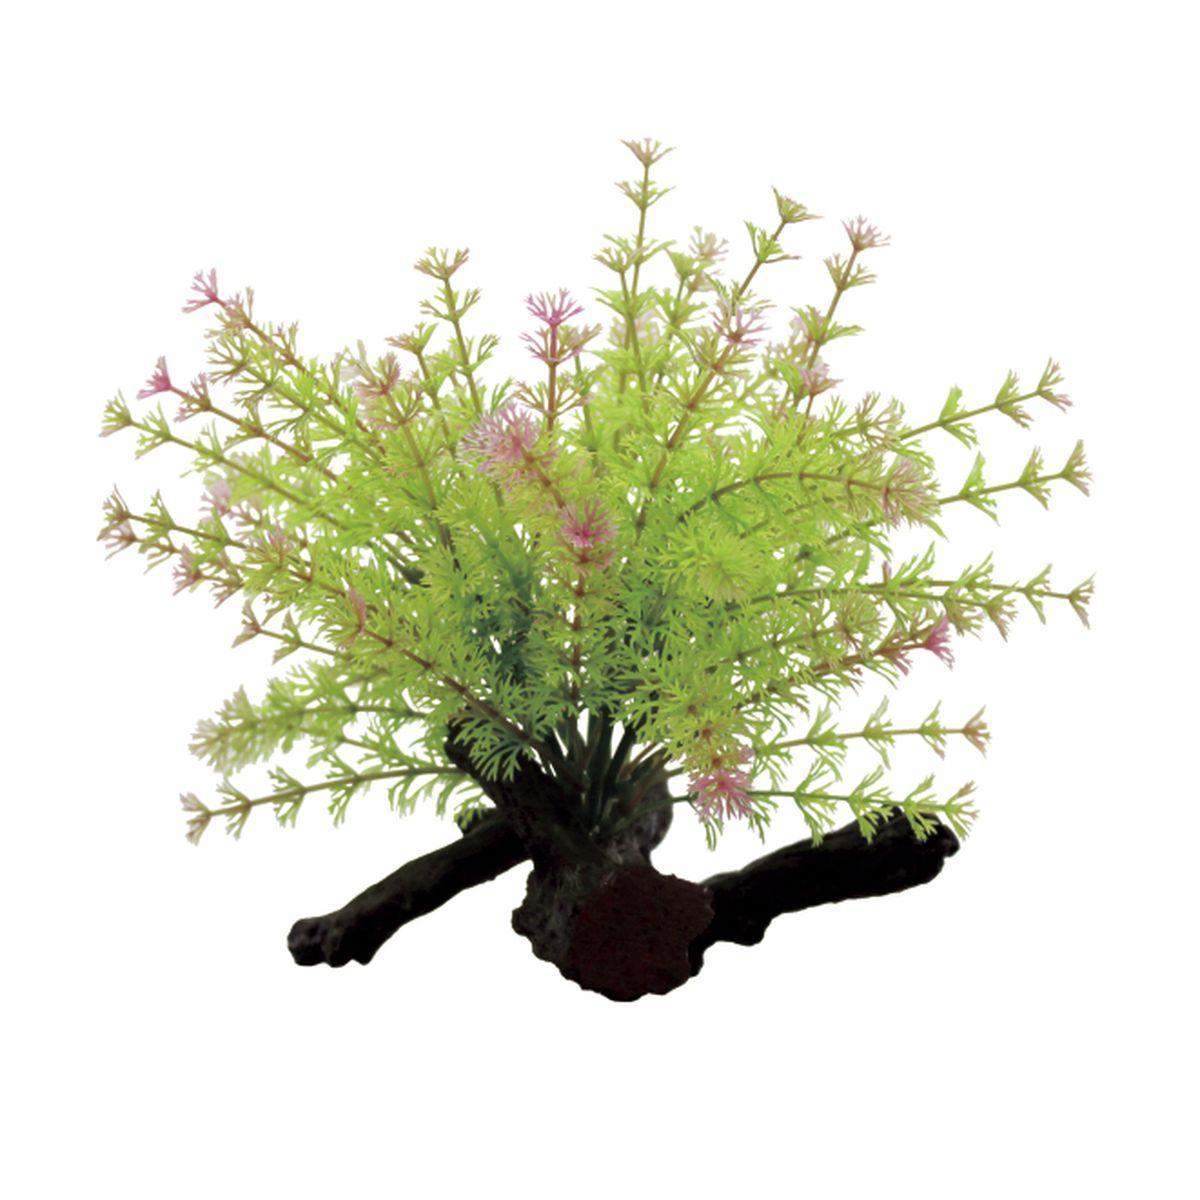 Композиция из растений для аквариума ArtUniq Лимнофила на коряге, 17 x 13 x 17 см0120710Композиция из растений для аквариума ArtUniq Лимнофила на коряге, 17 x 13 x 17 см